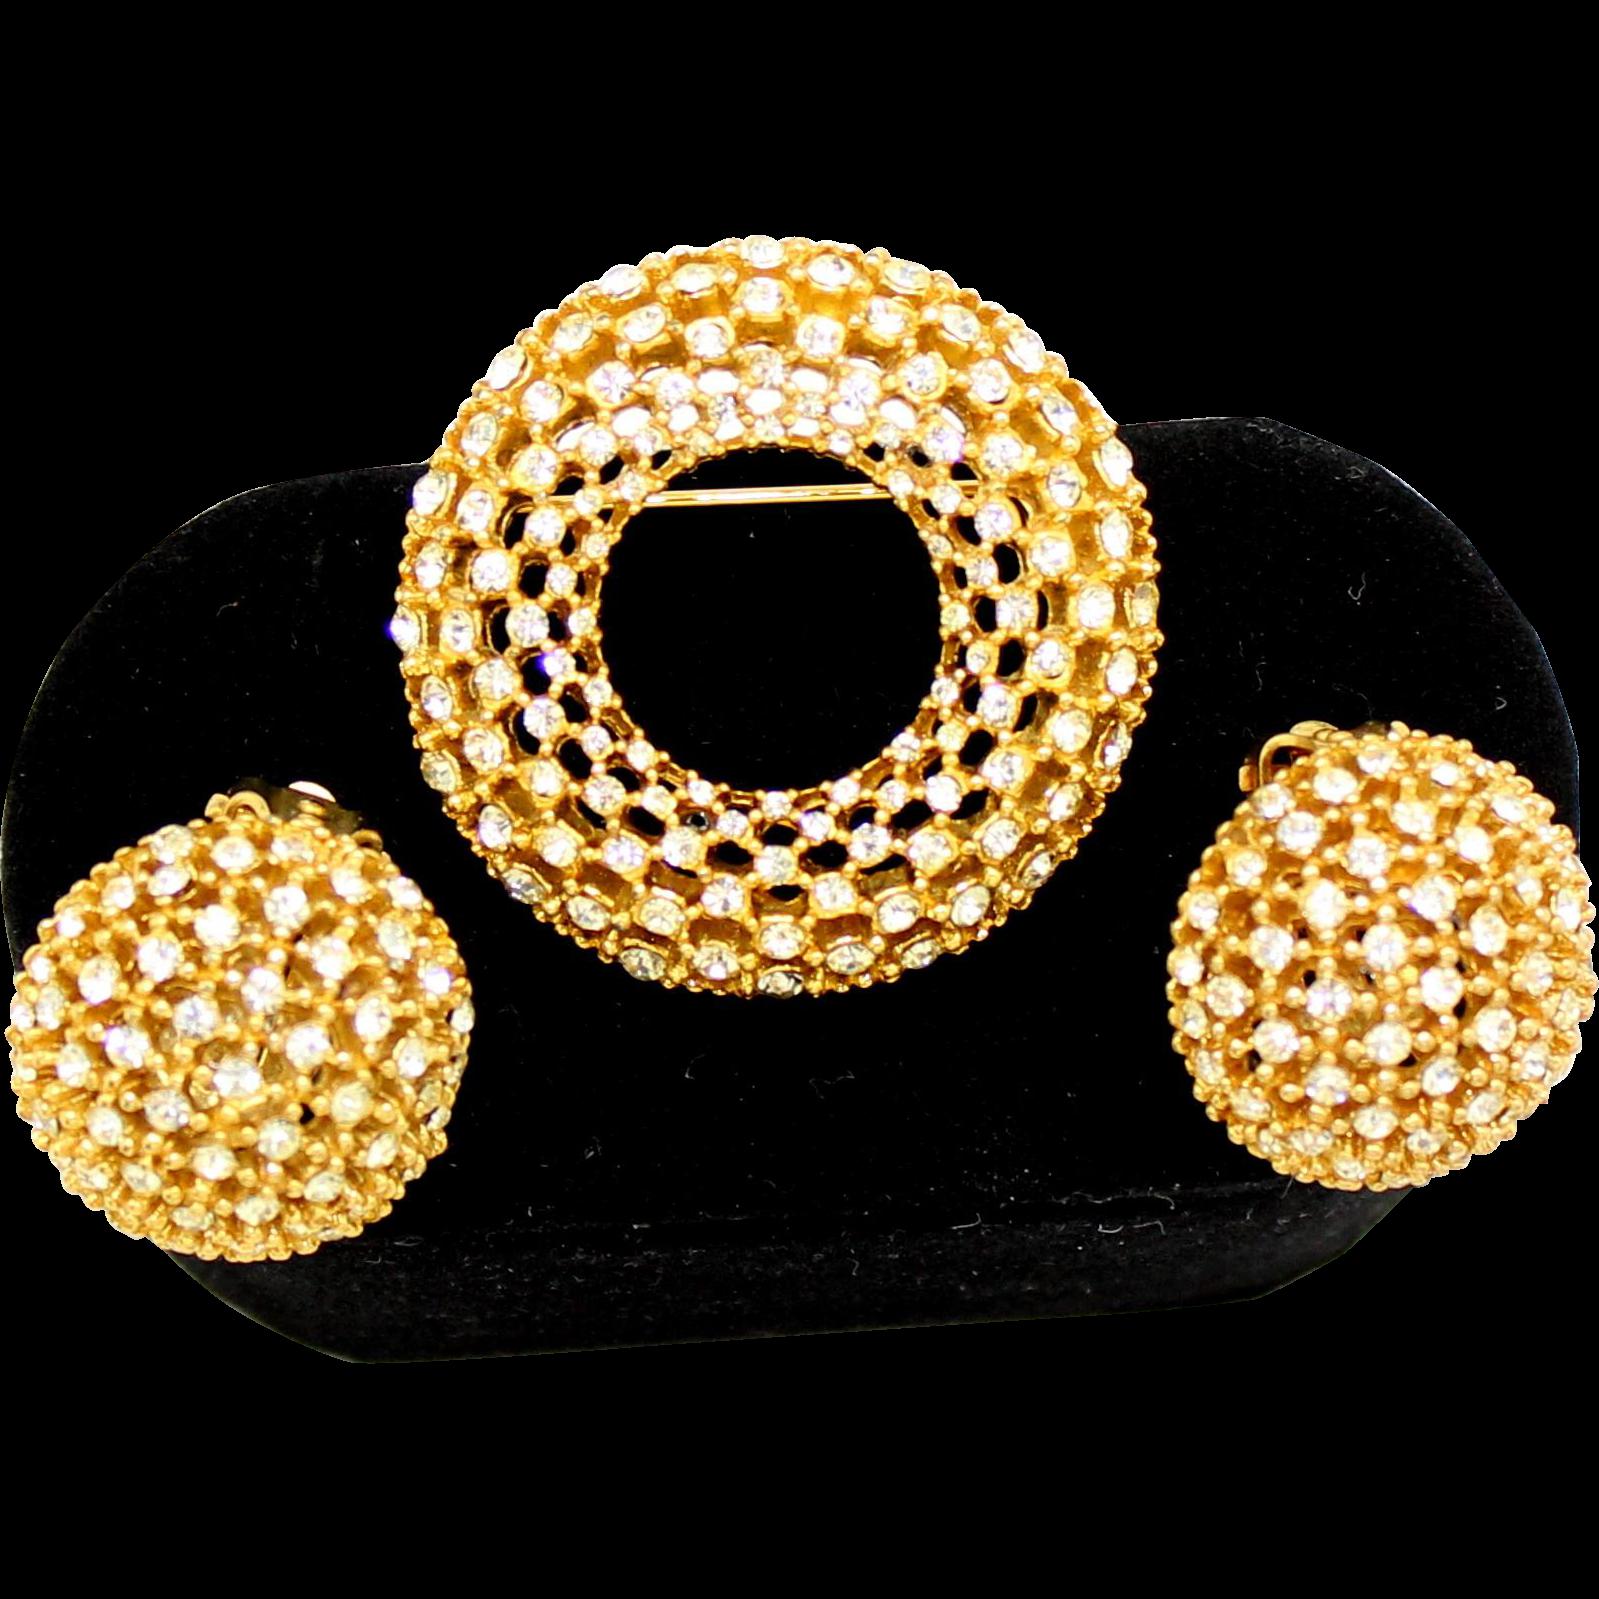 Vintage Clear Rhinestone Wreath Brooch and Earrings Demi Parure